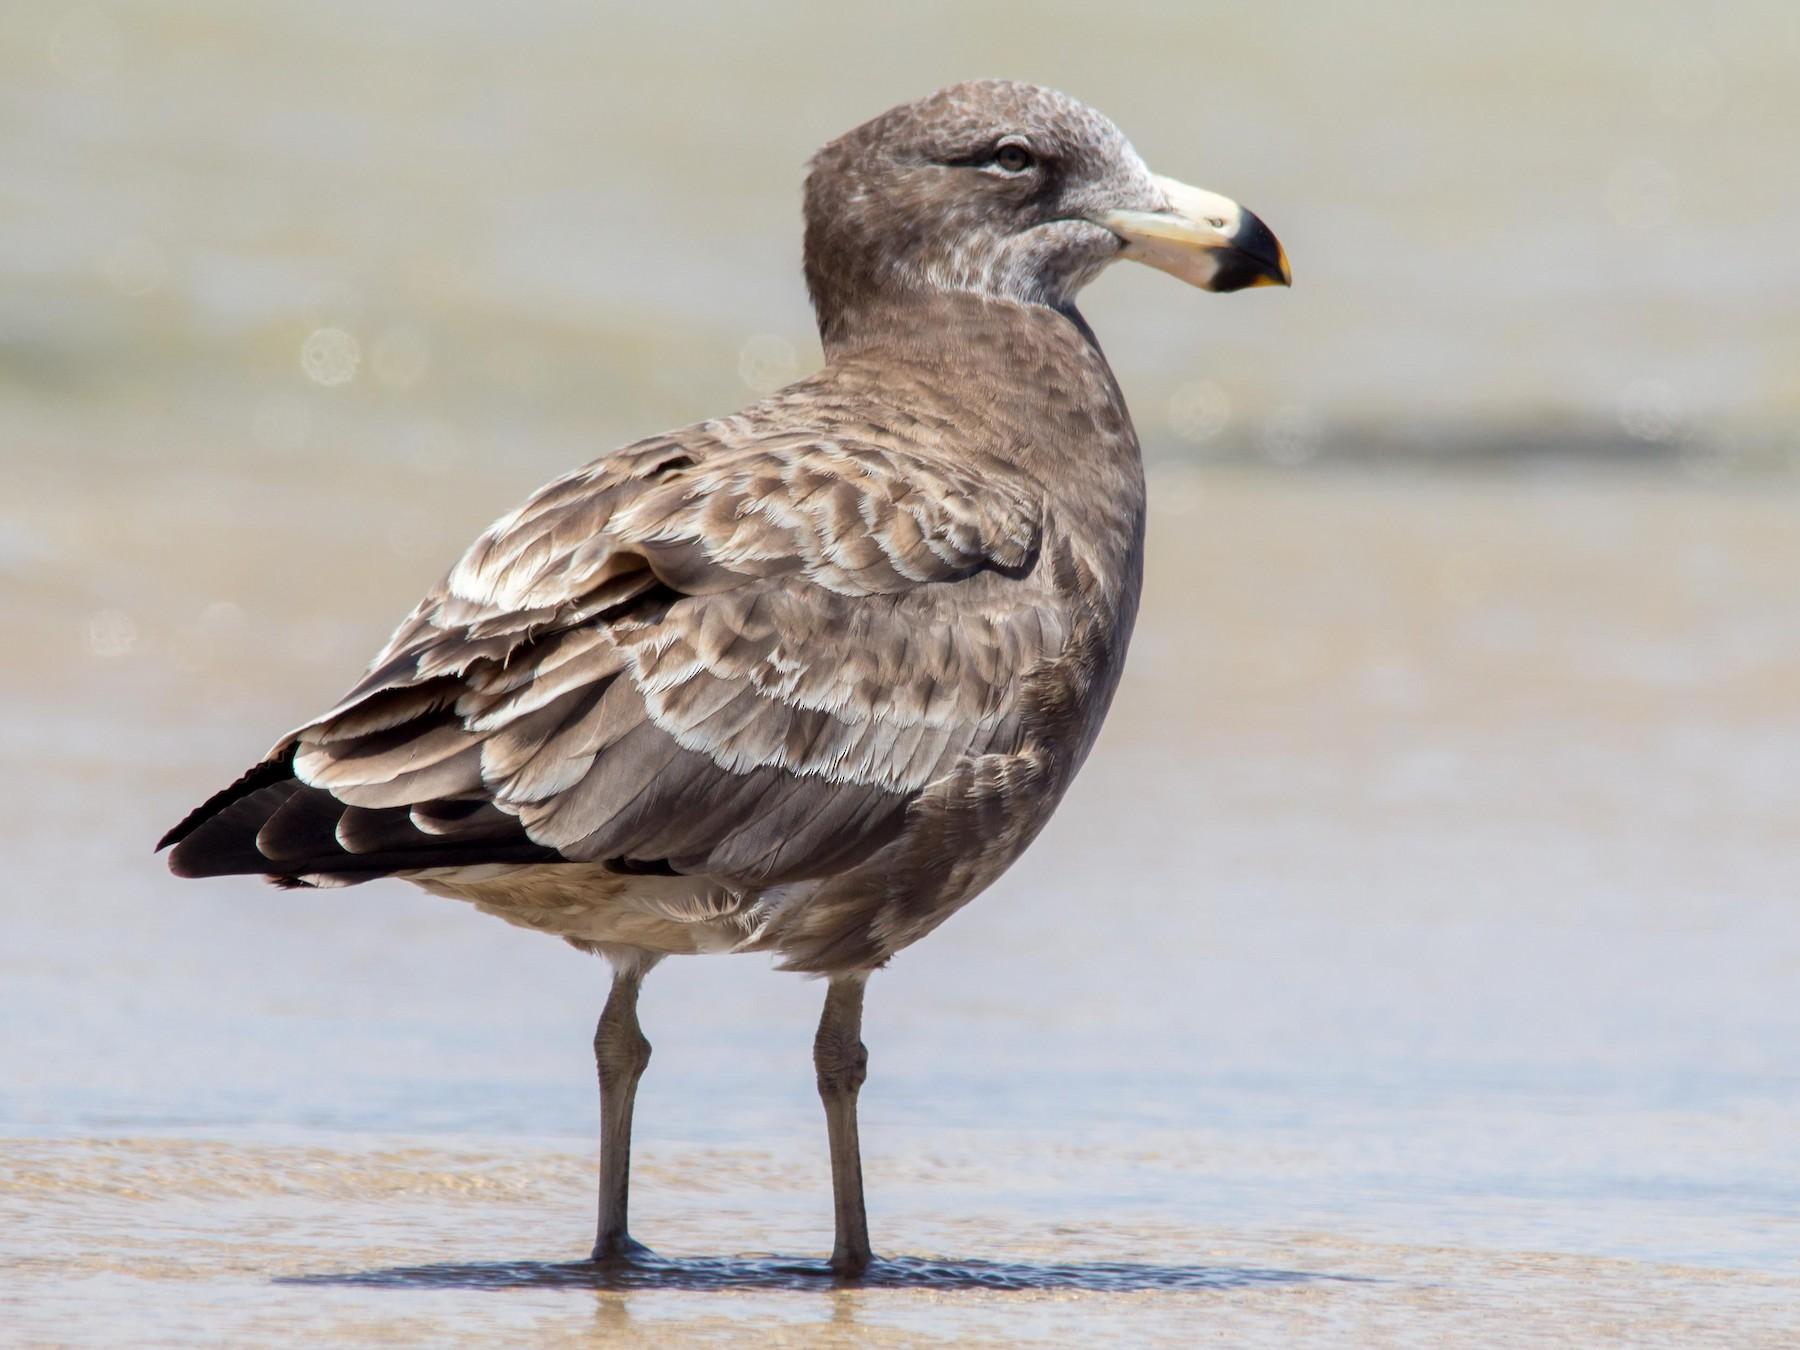 Pacific Gull - Andrew Allen